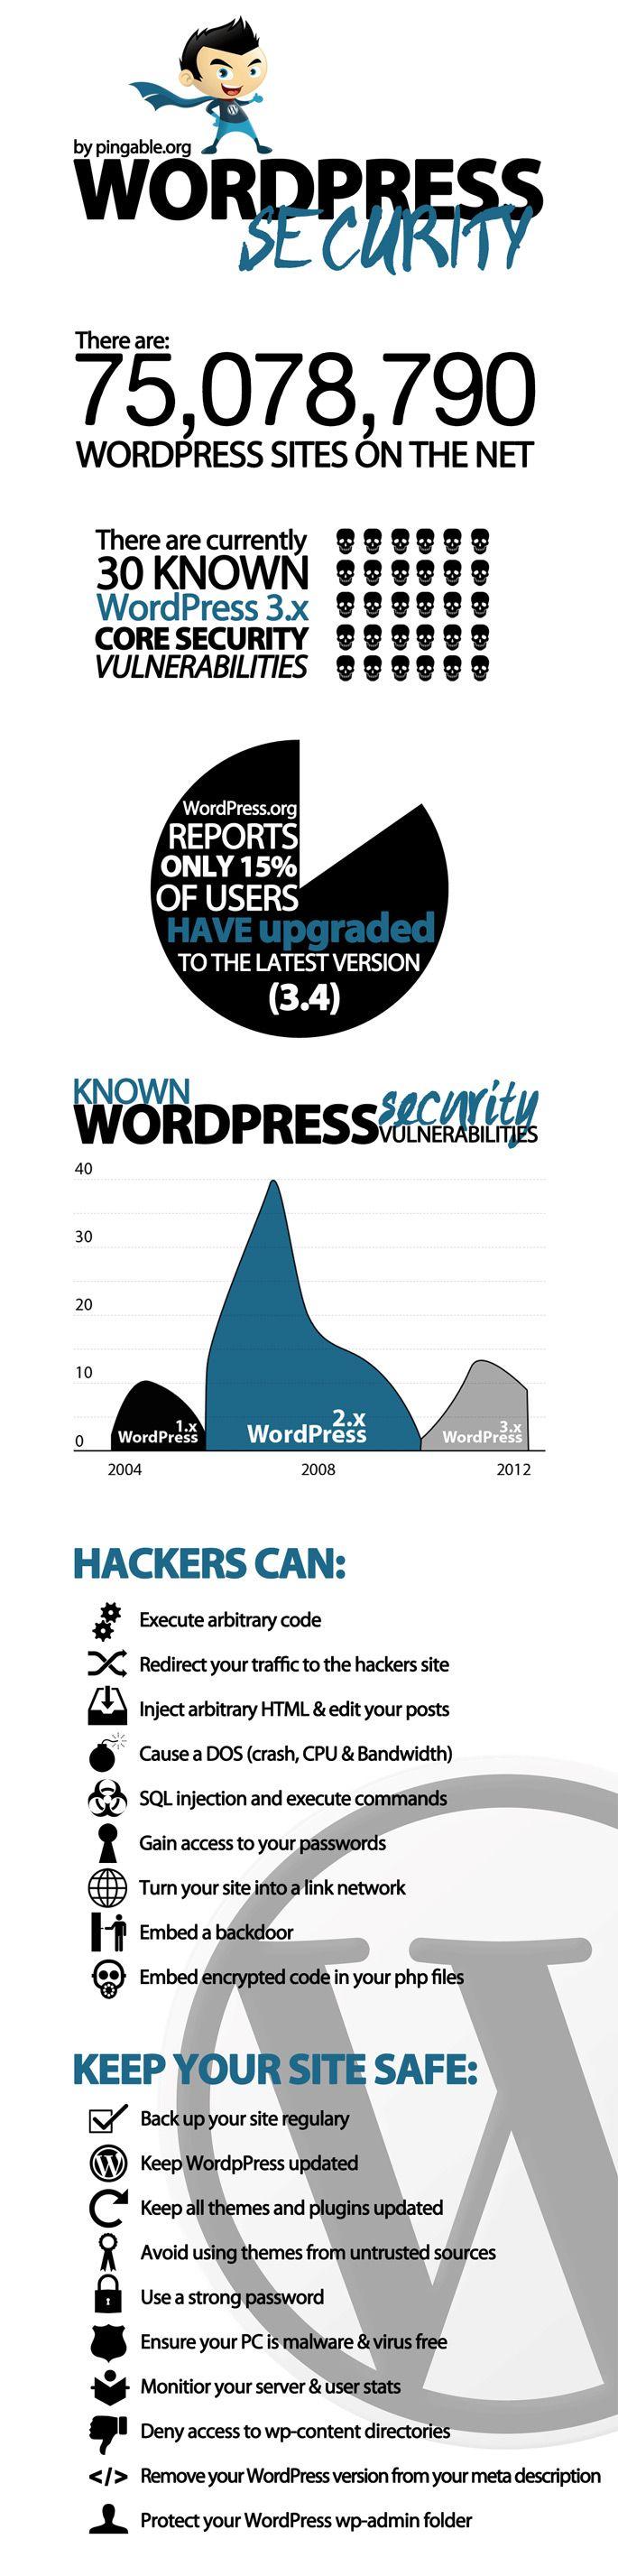 WordPress Security. #Infographics #wordpress #wordpressthemes #wordpresstips